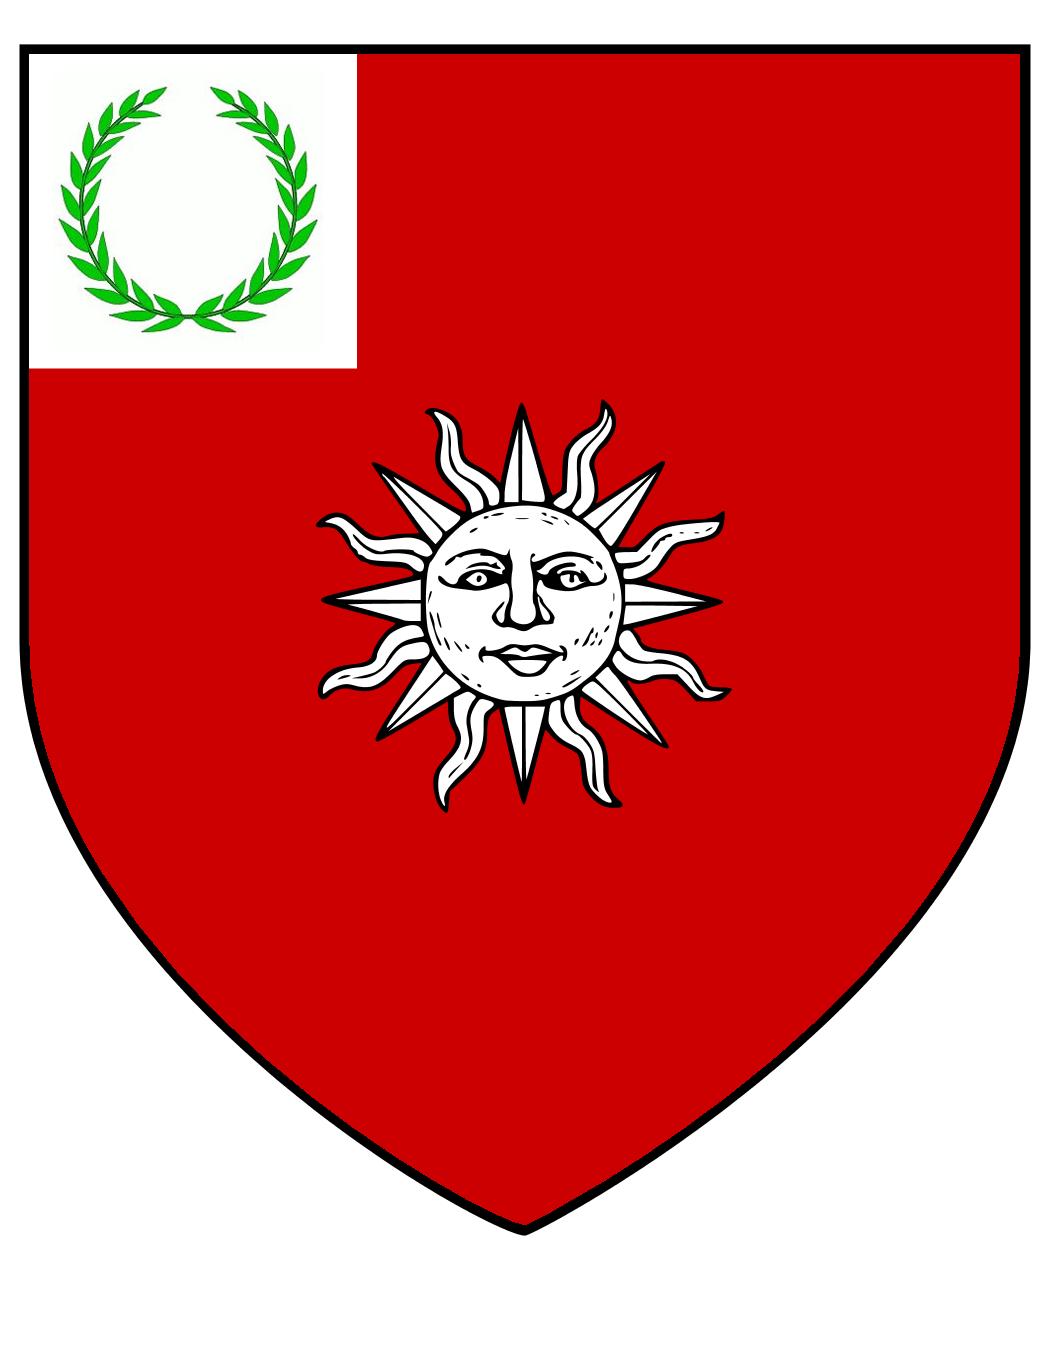 Colard_de_Parcey_coat_of_arms.png